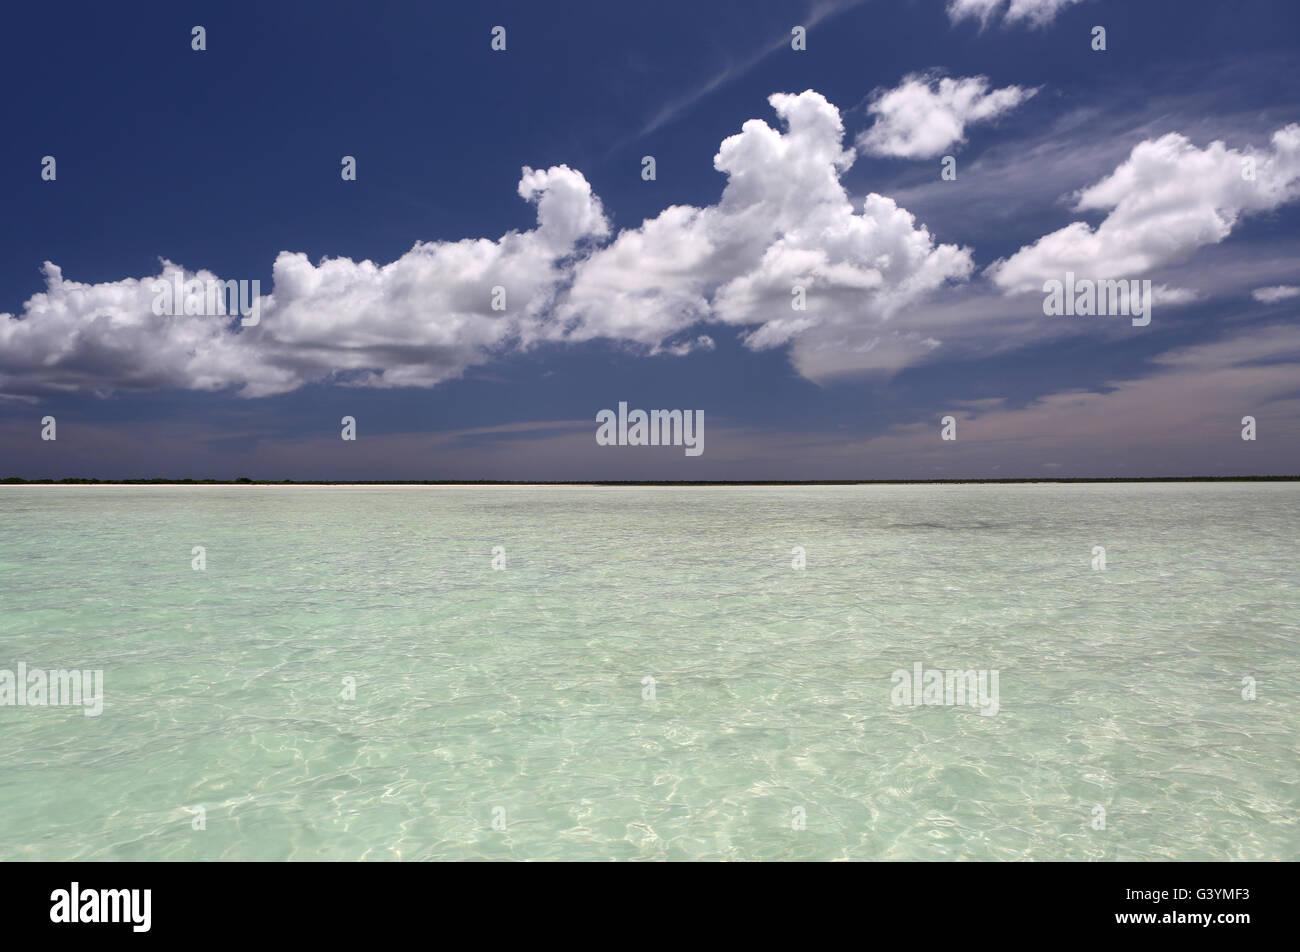 Blue sky and fluffy clouds over lagoon, Christmas Island, Kiribati - Stock Image